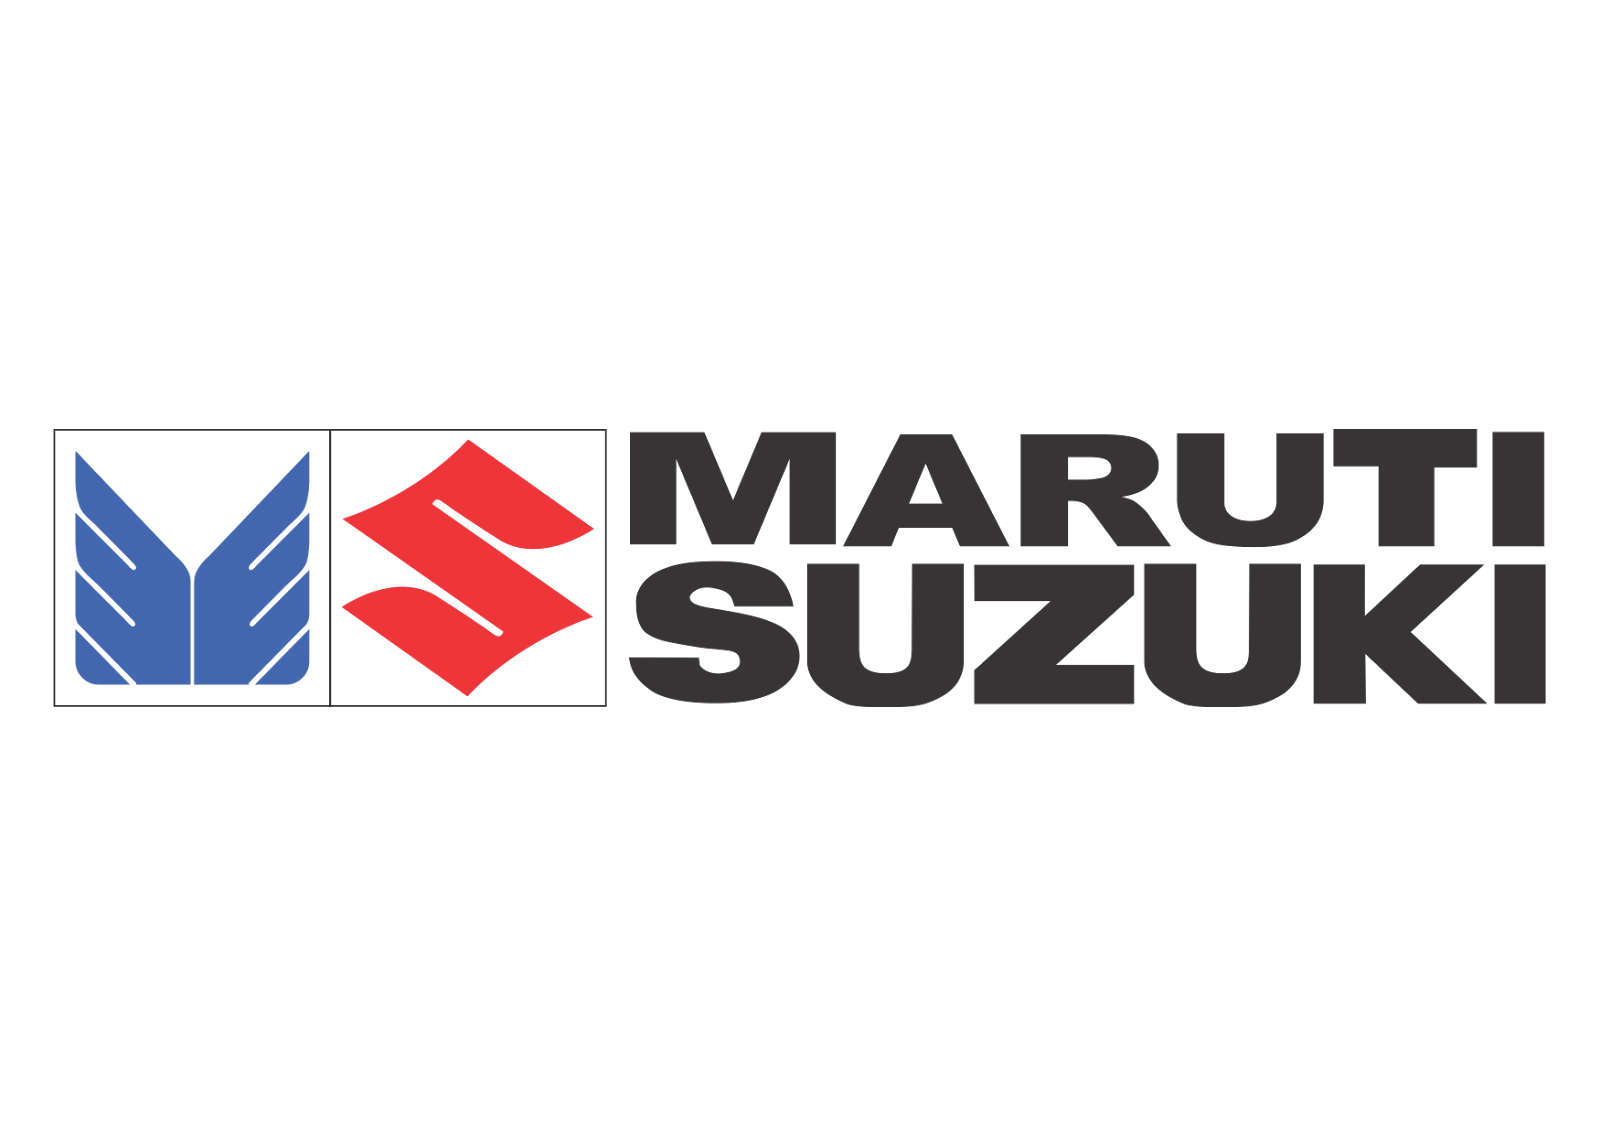 MARTUI SUZUKI